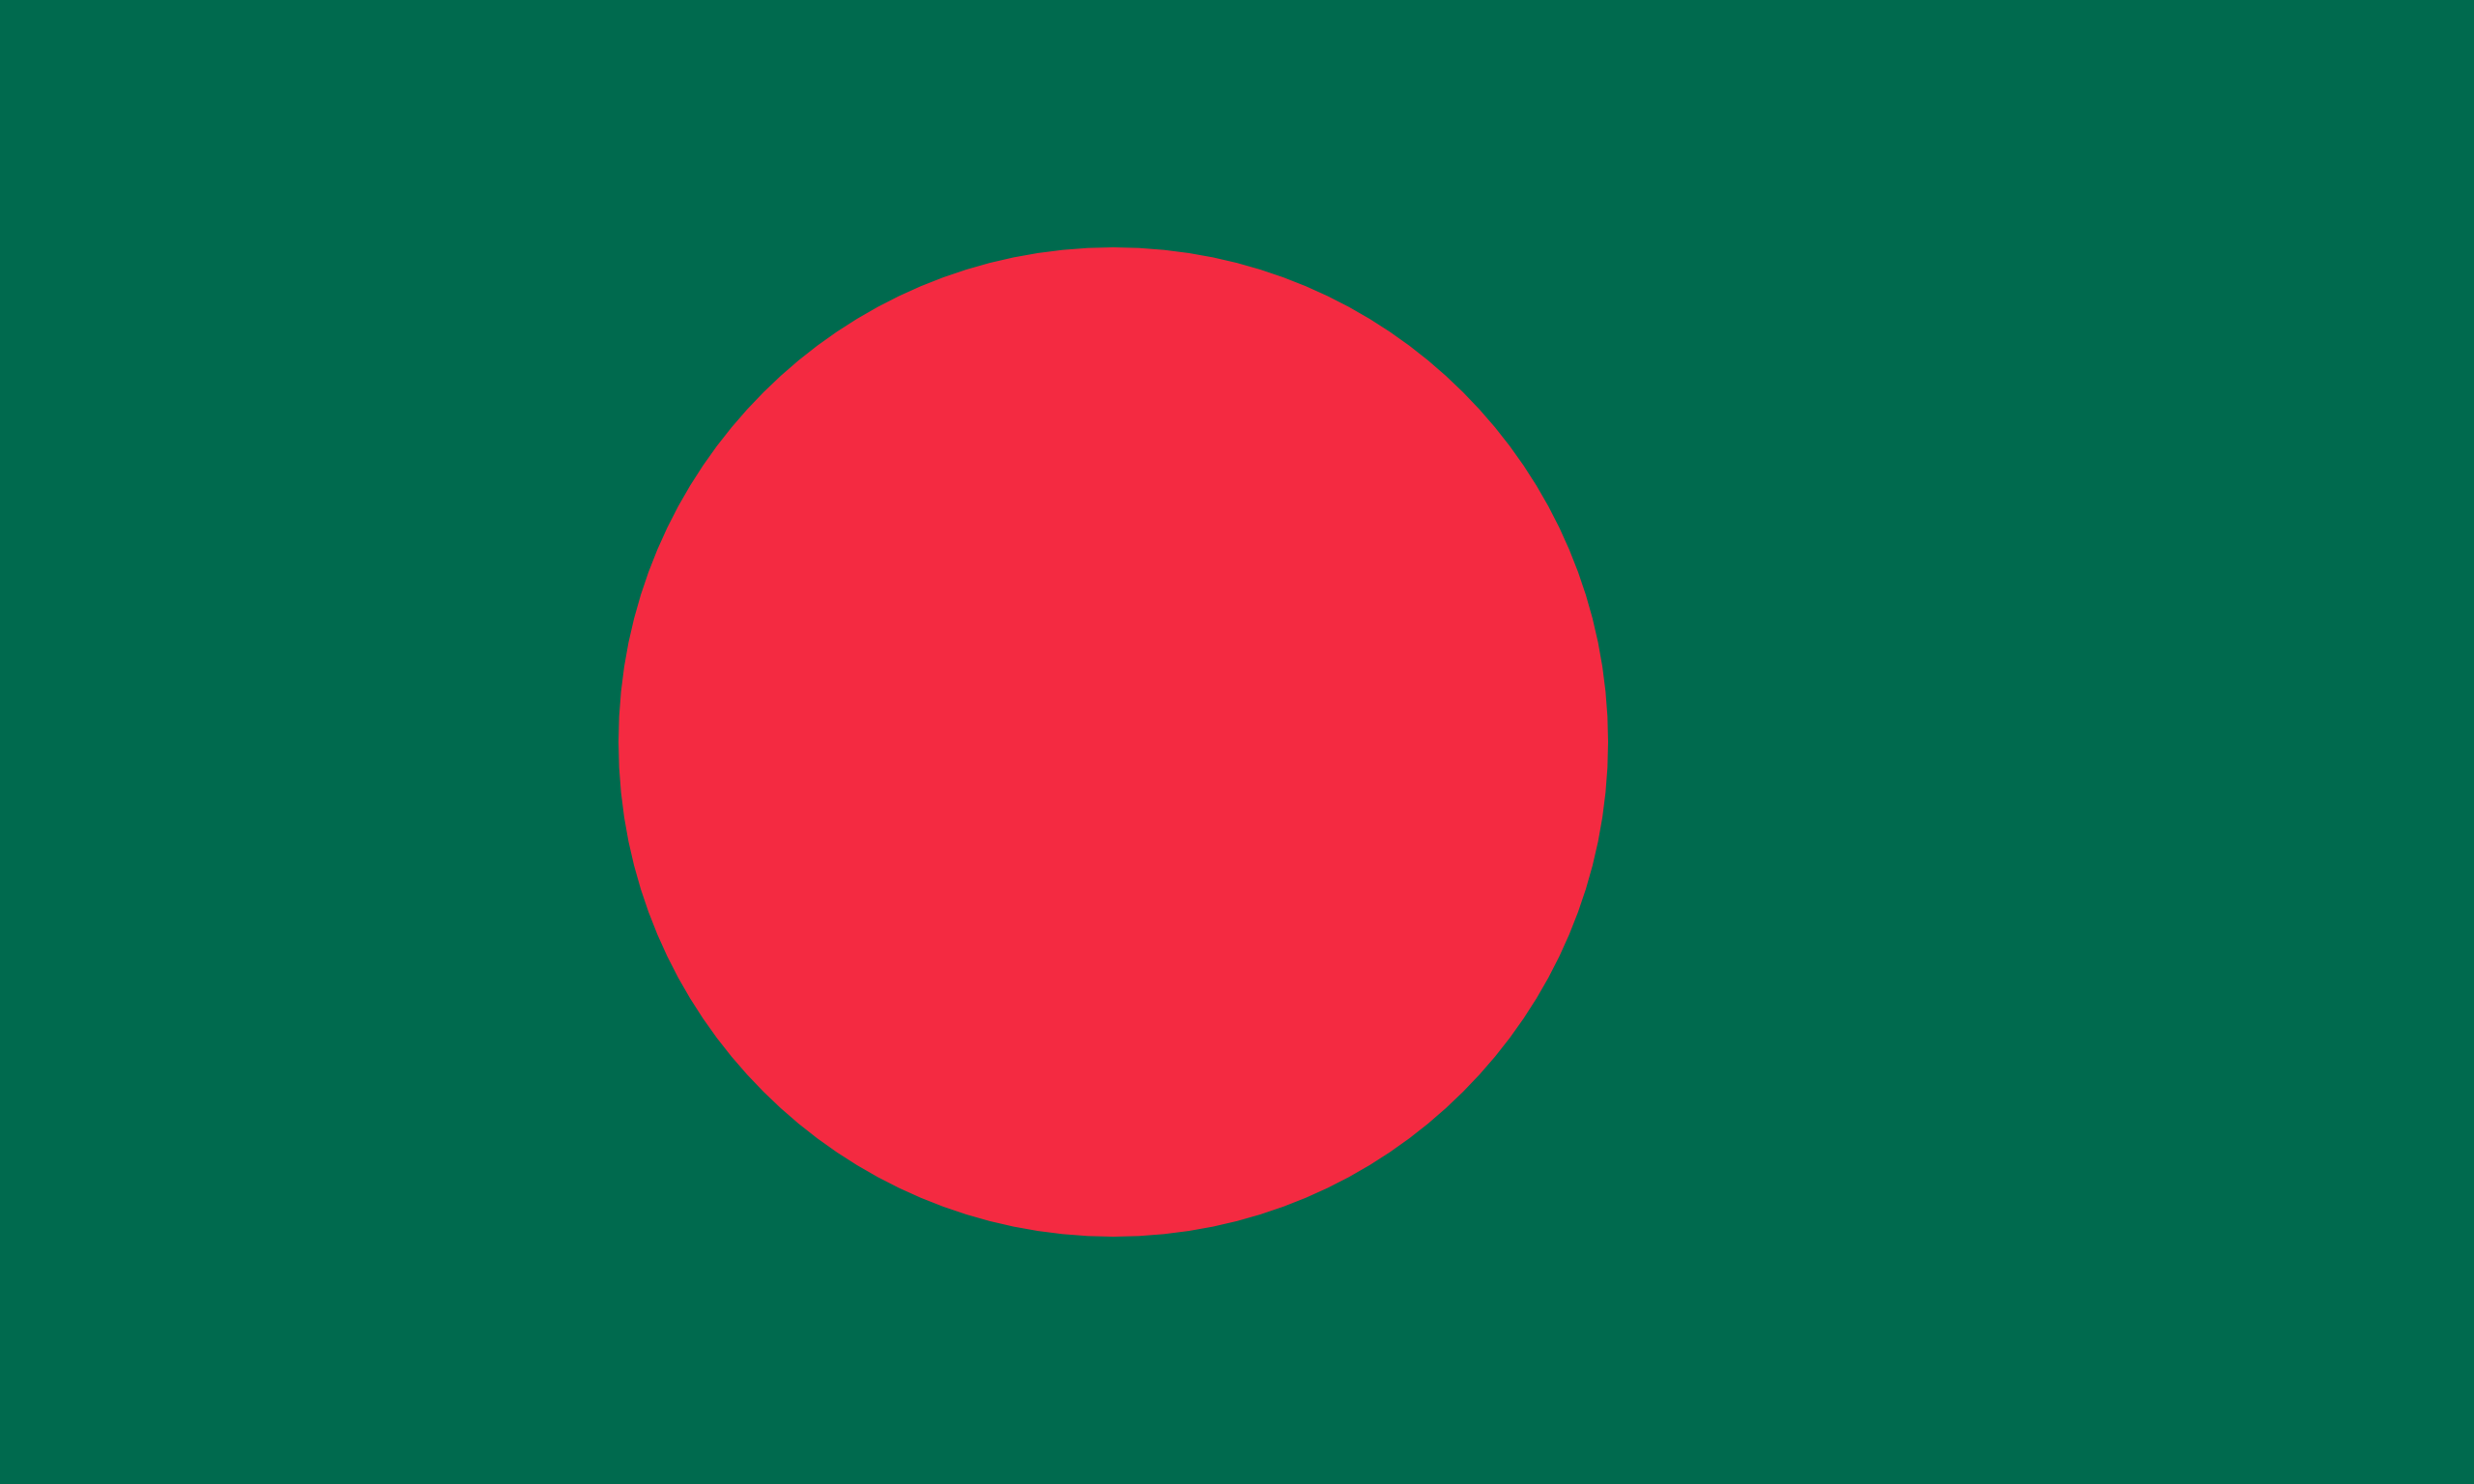 Embassy of Bangladesh